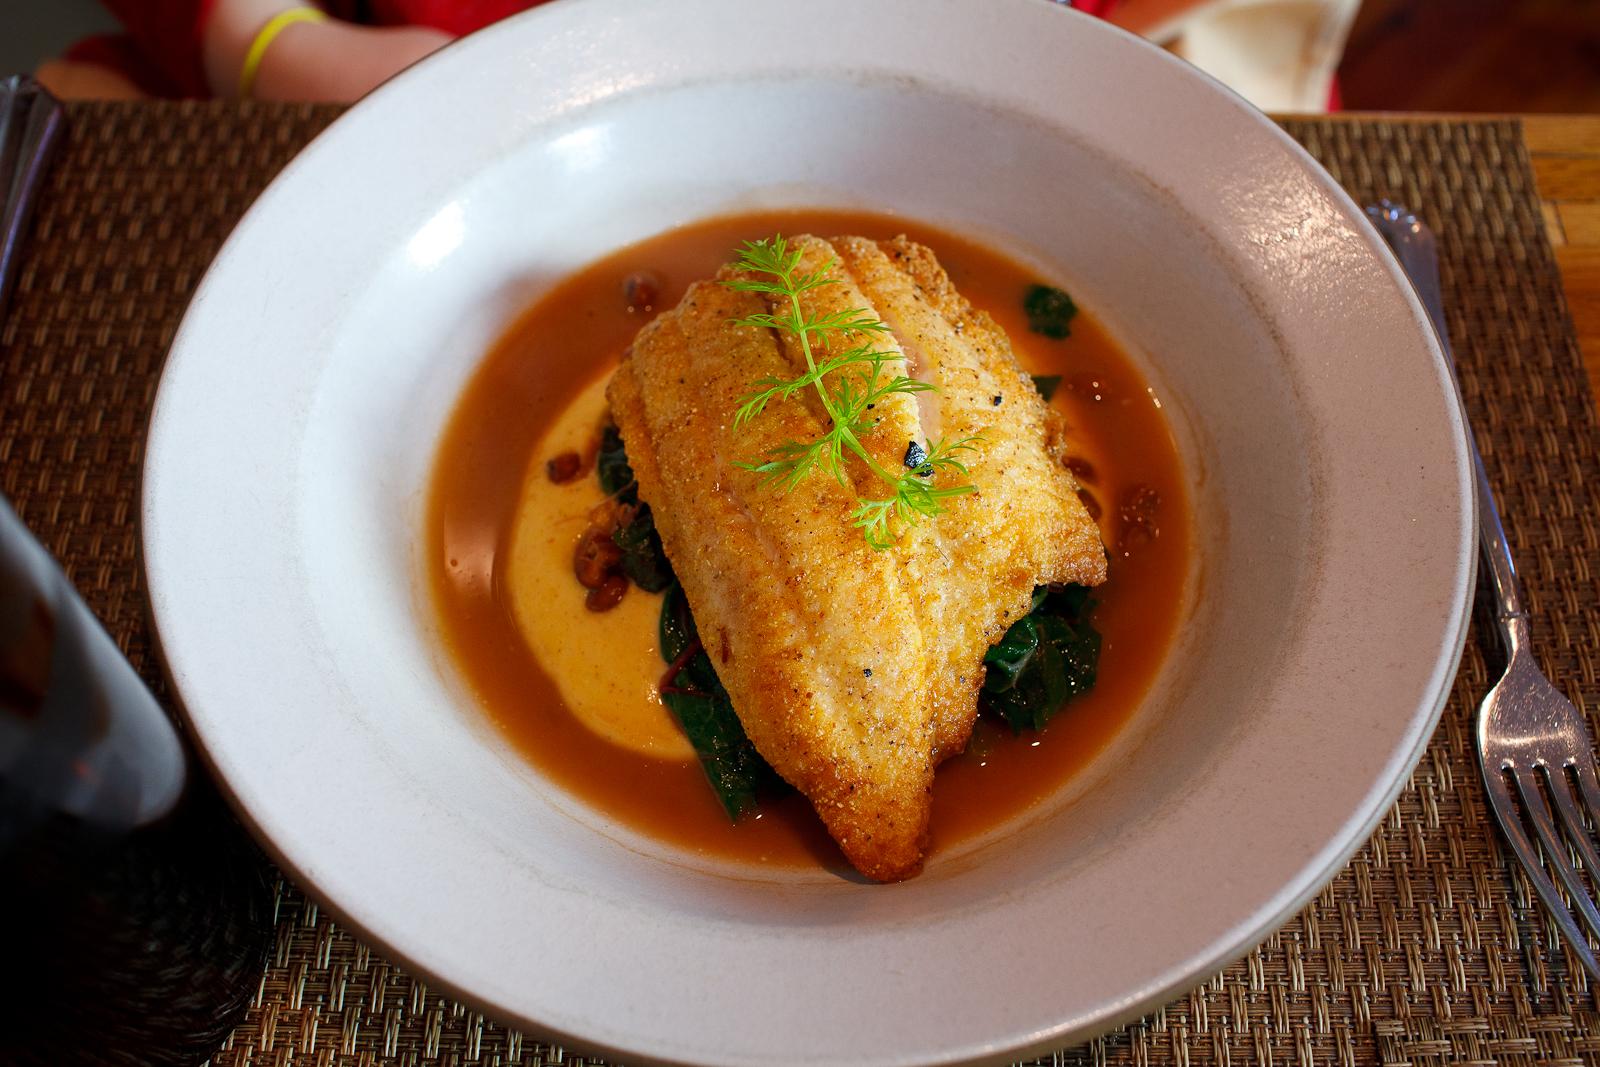 Cornmeal Dusted Catfish with Cornbread Puree, Smoky Sea Island Red Peas and Rainbow Chard